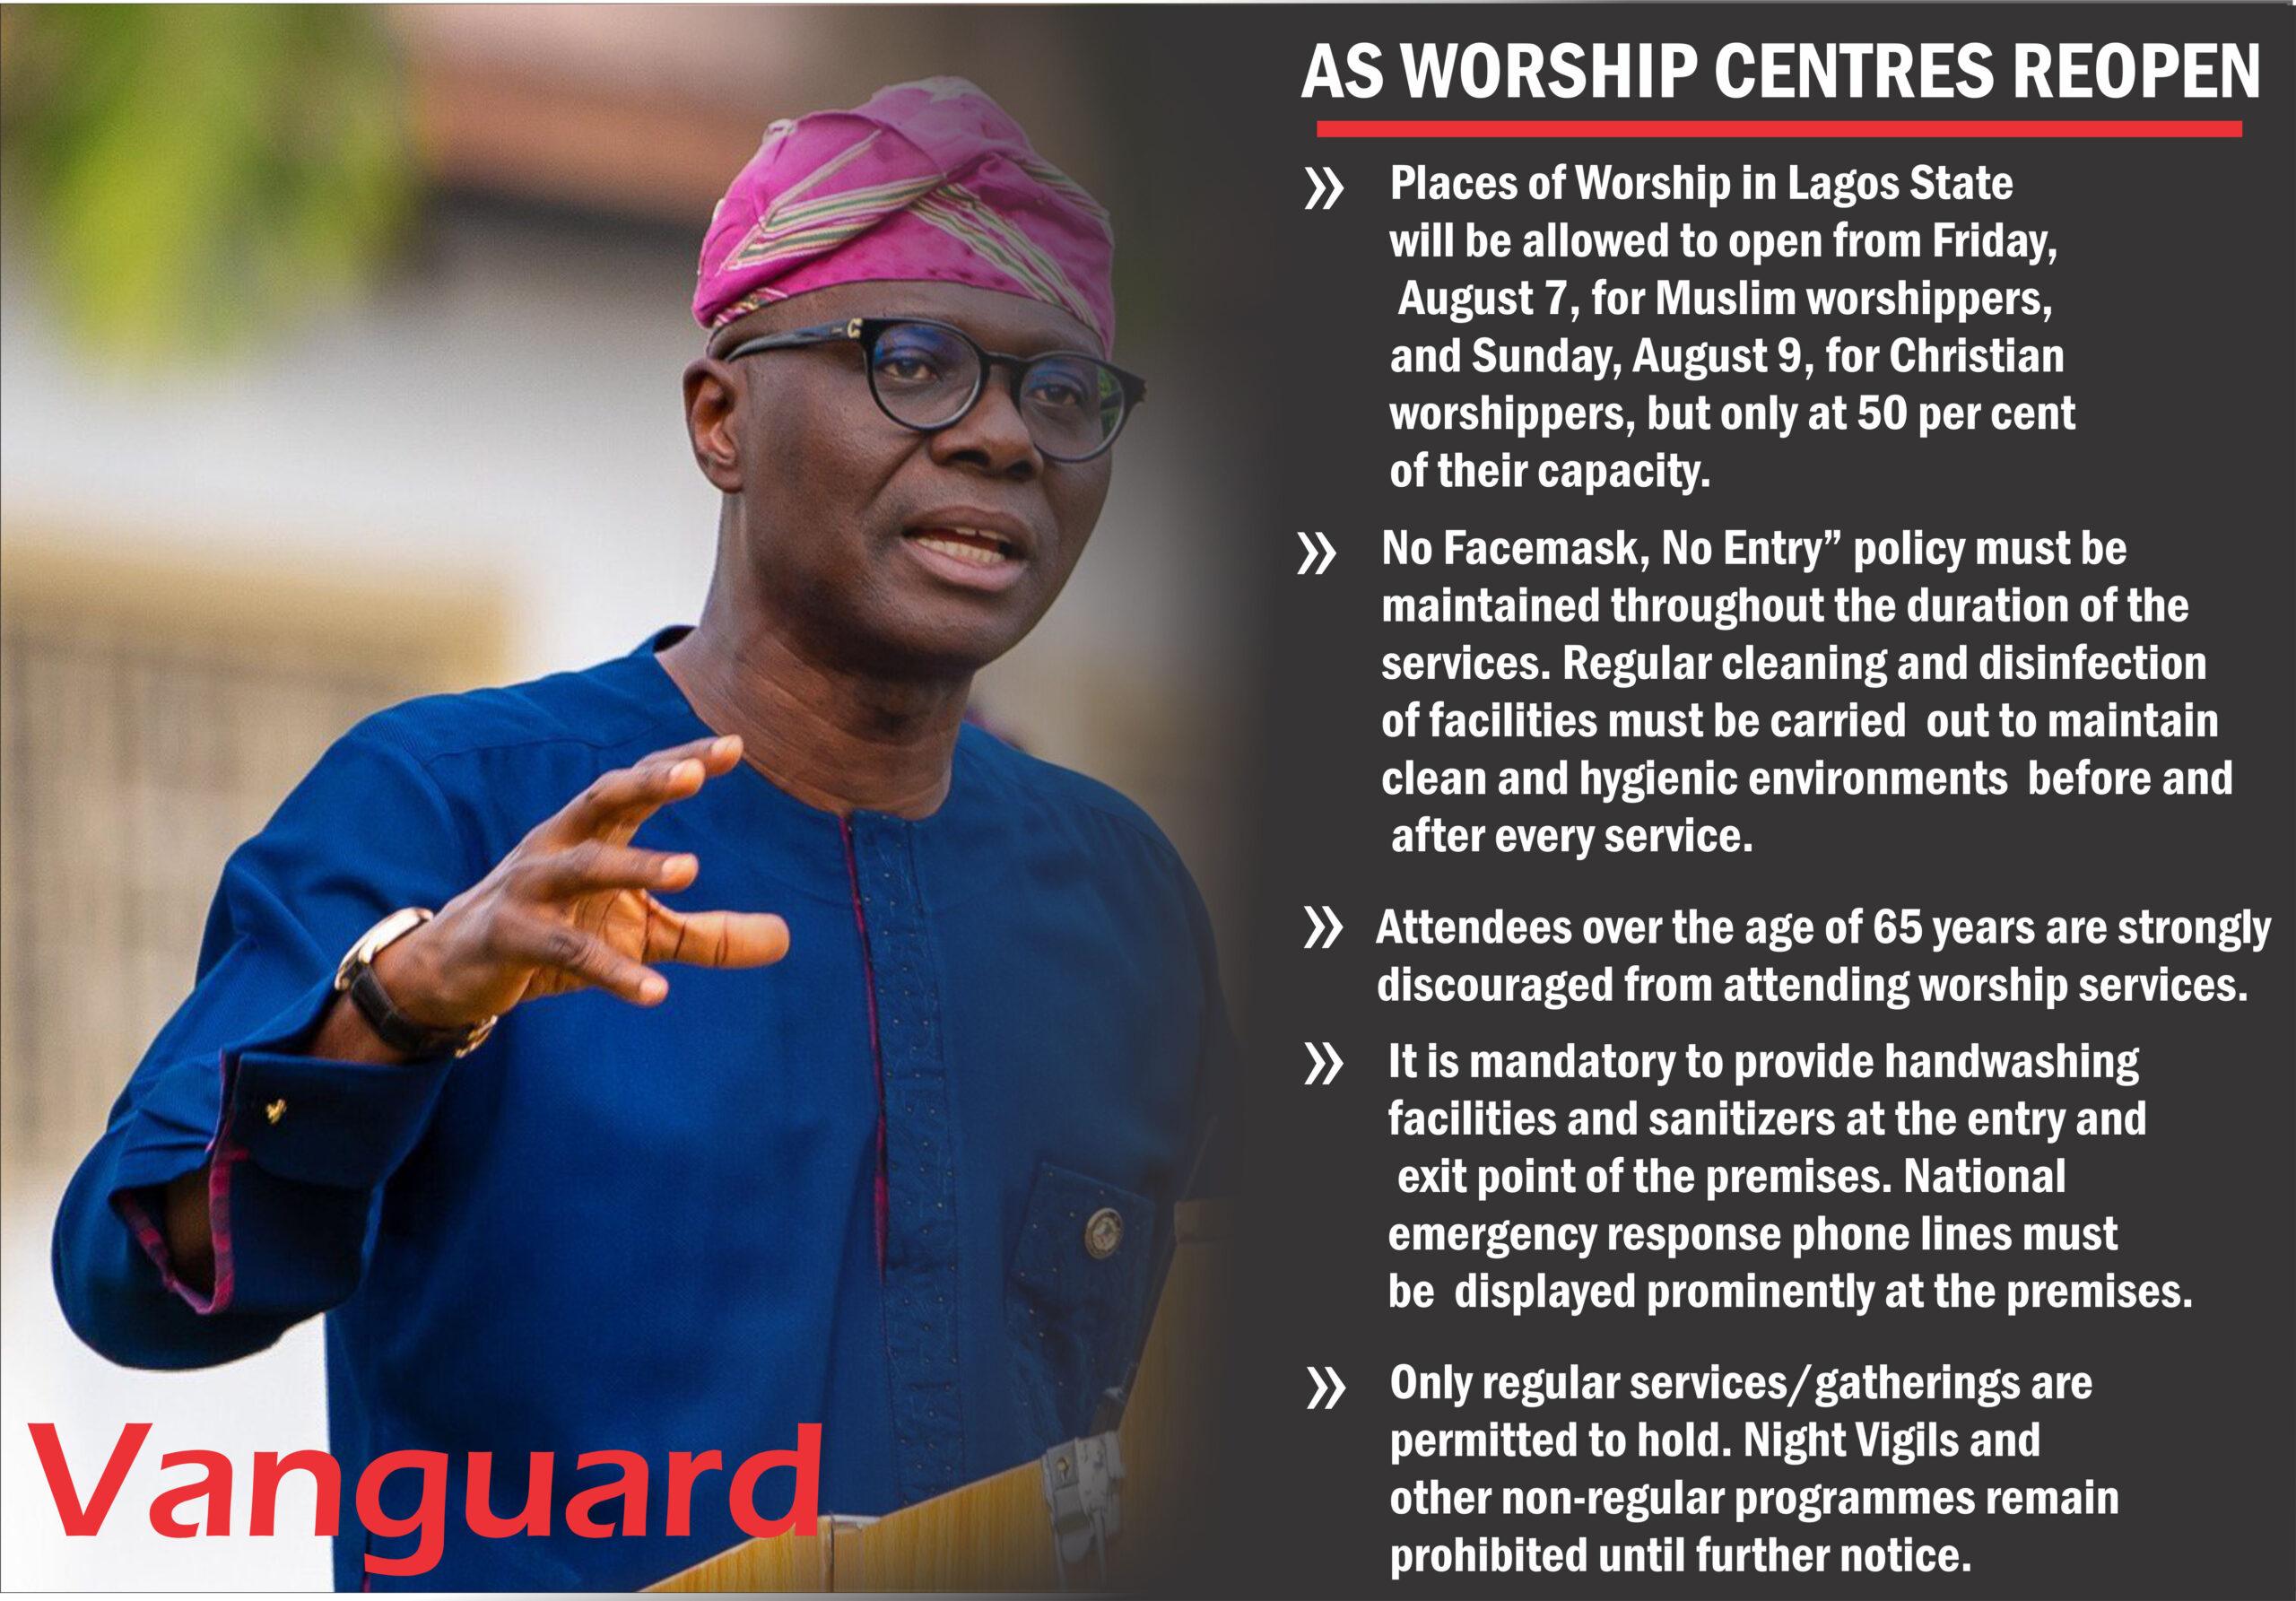 Spas, night clubs, cinemas, bars remain shut in Lagos